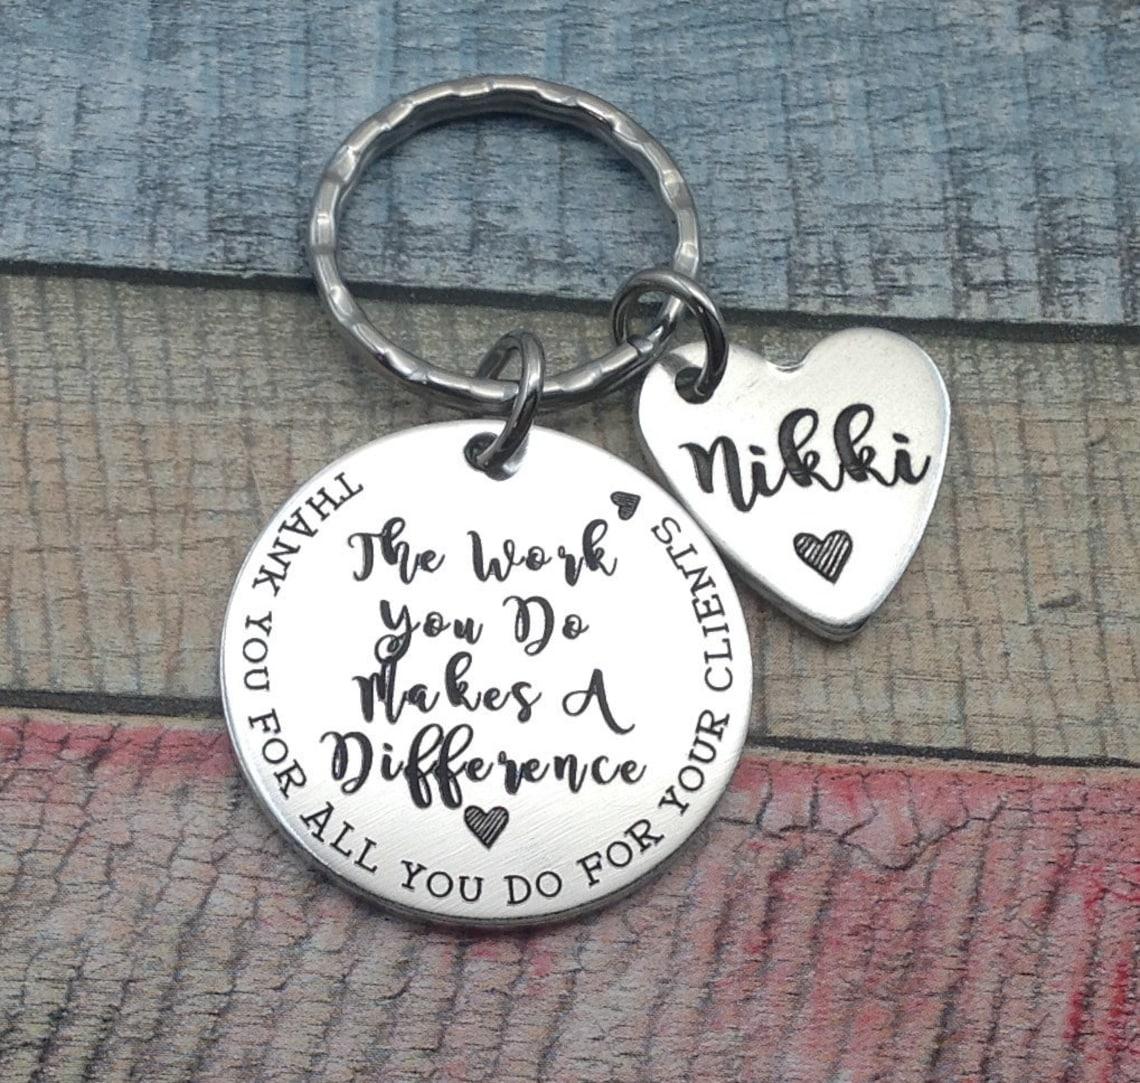 Stamped metal keychain.